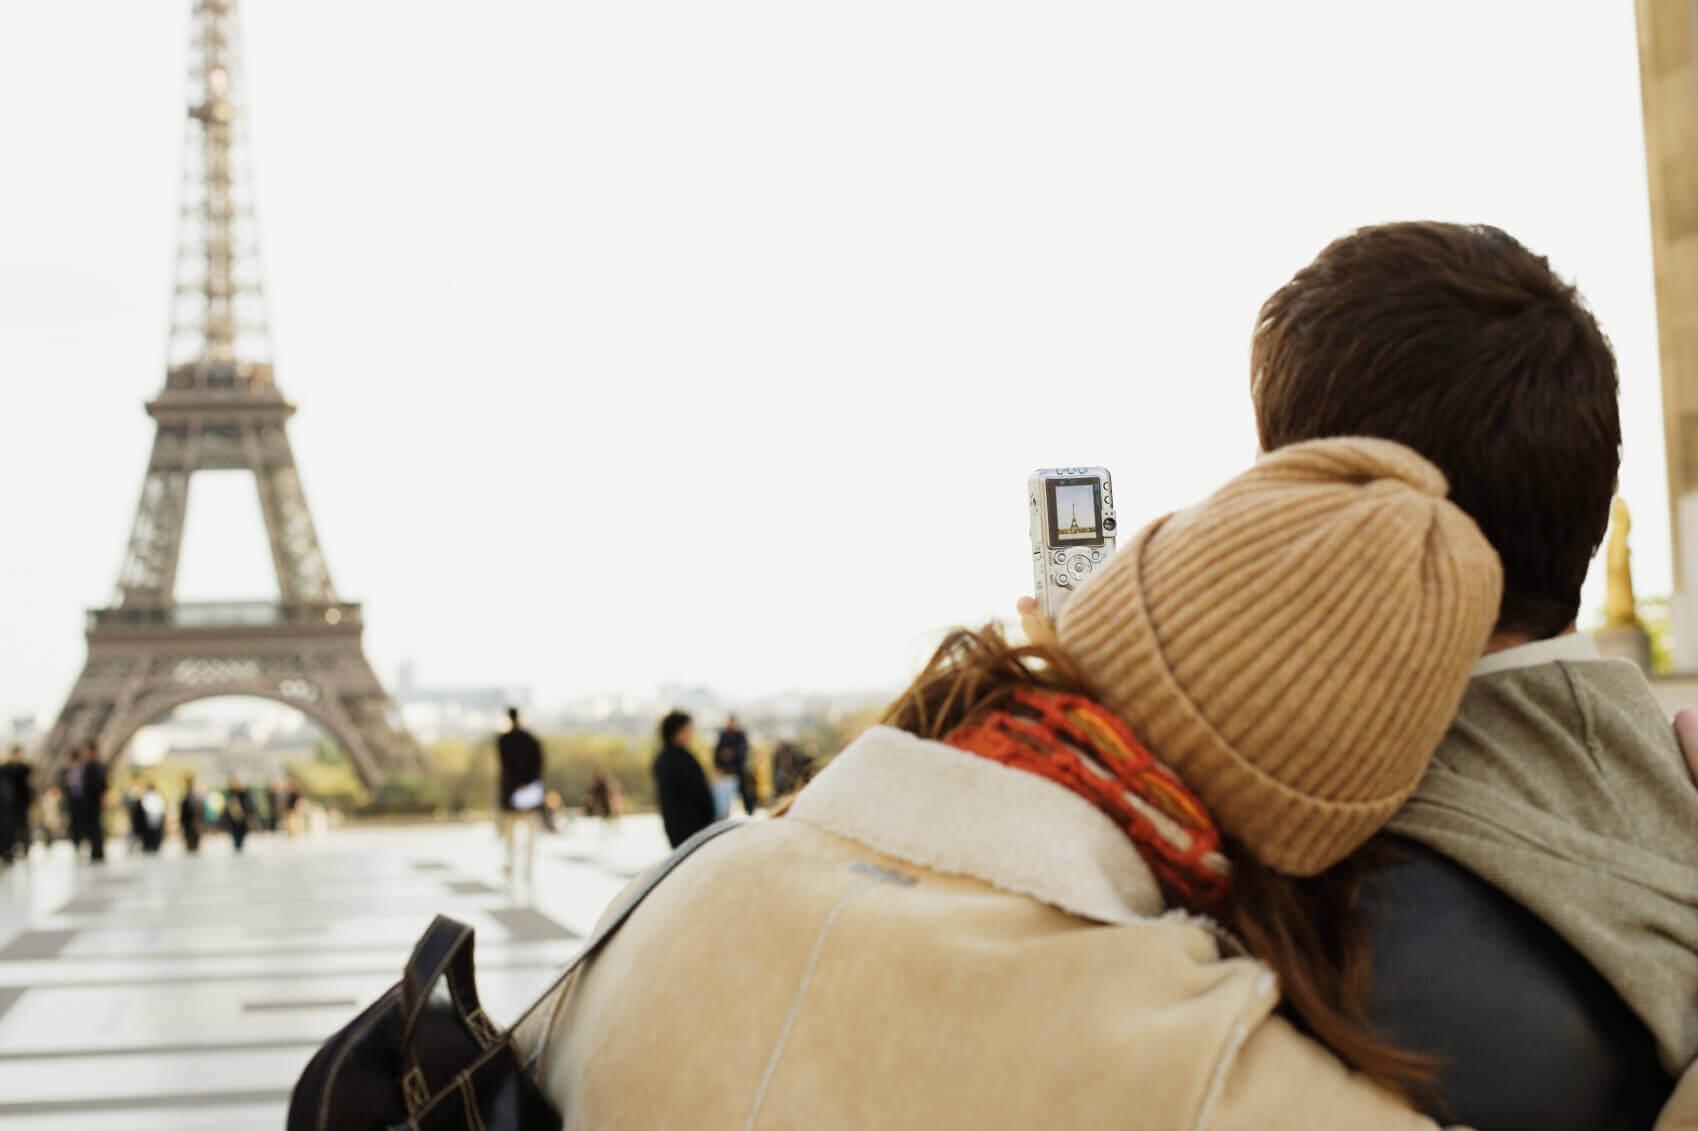 A couple in Paris on honeymoon